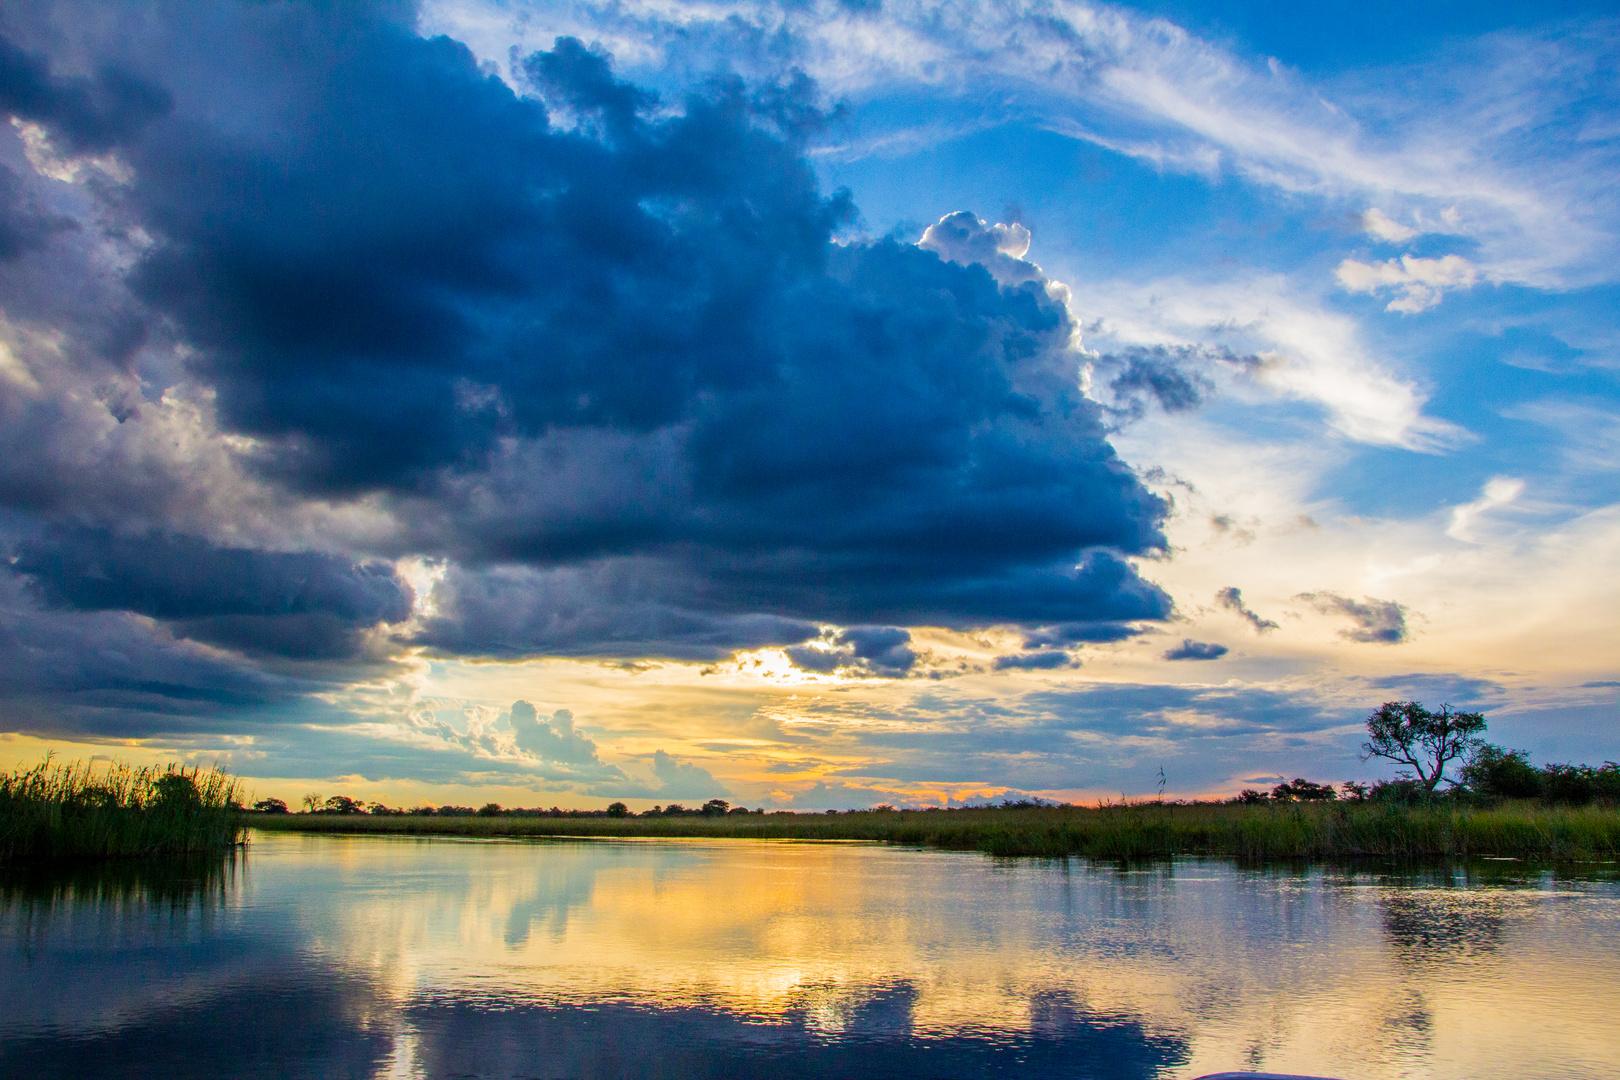 Sunset River Cruise, Kwando, Nambia